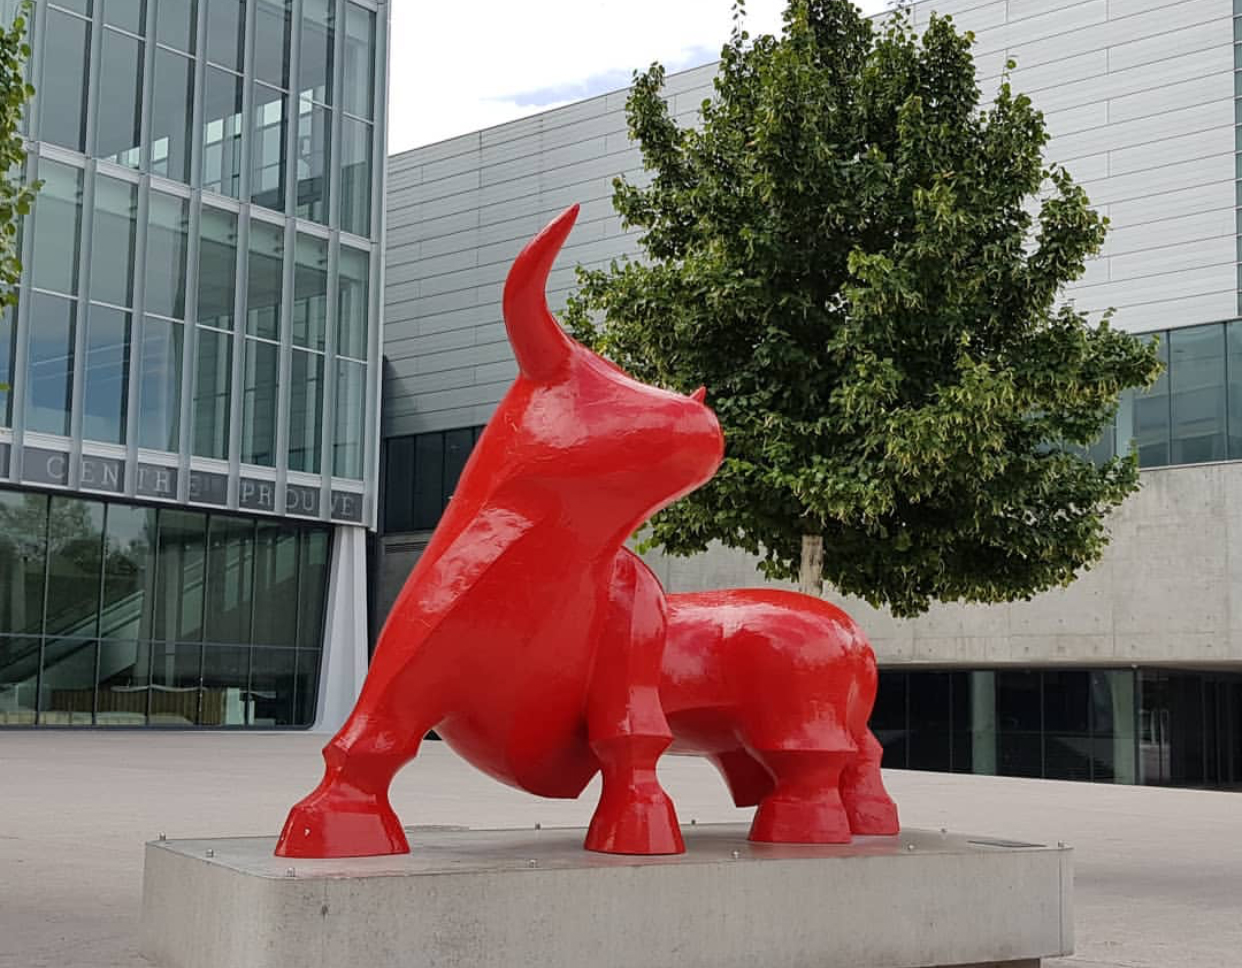 Public Art Animal Red Bull Large Bronze Sculpture